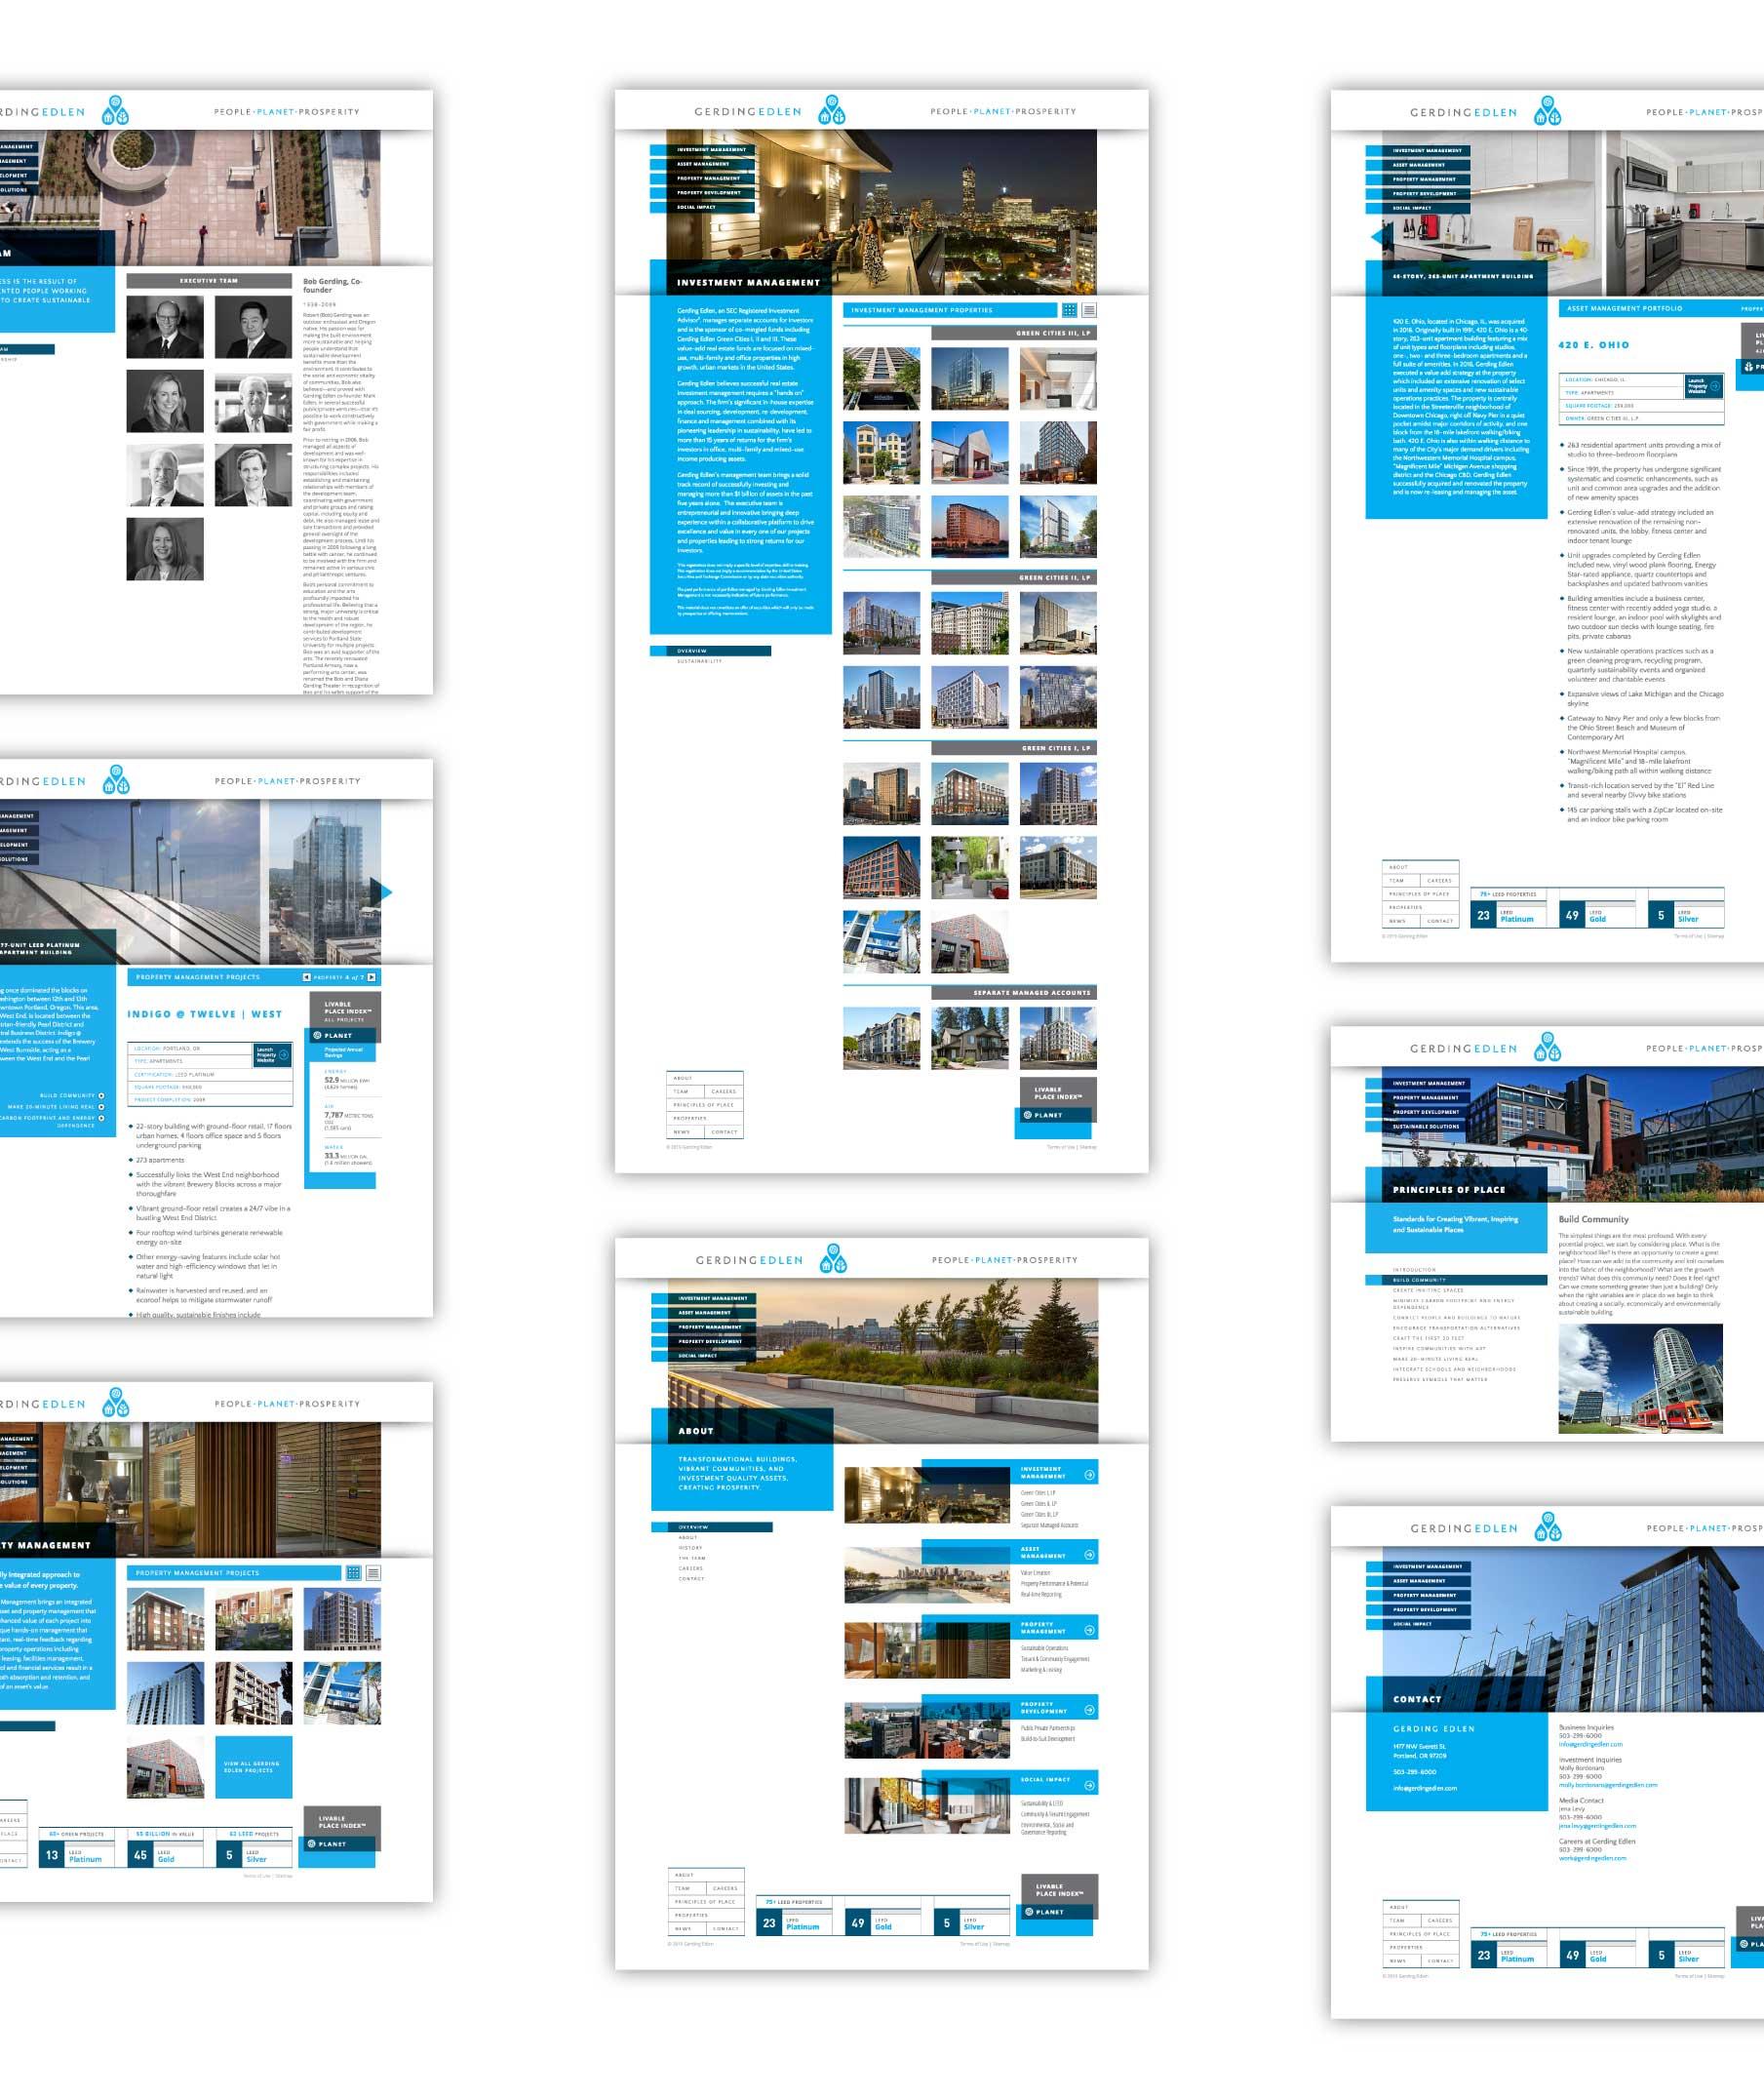 Gerding-Edlen-Website-Overview.jpg